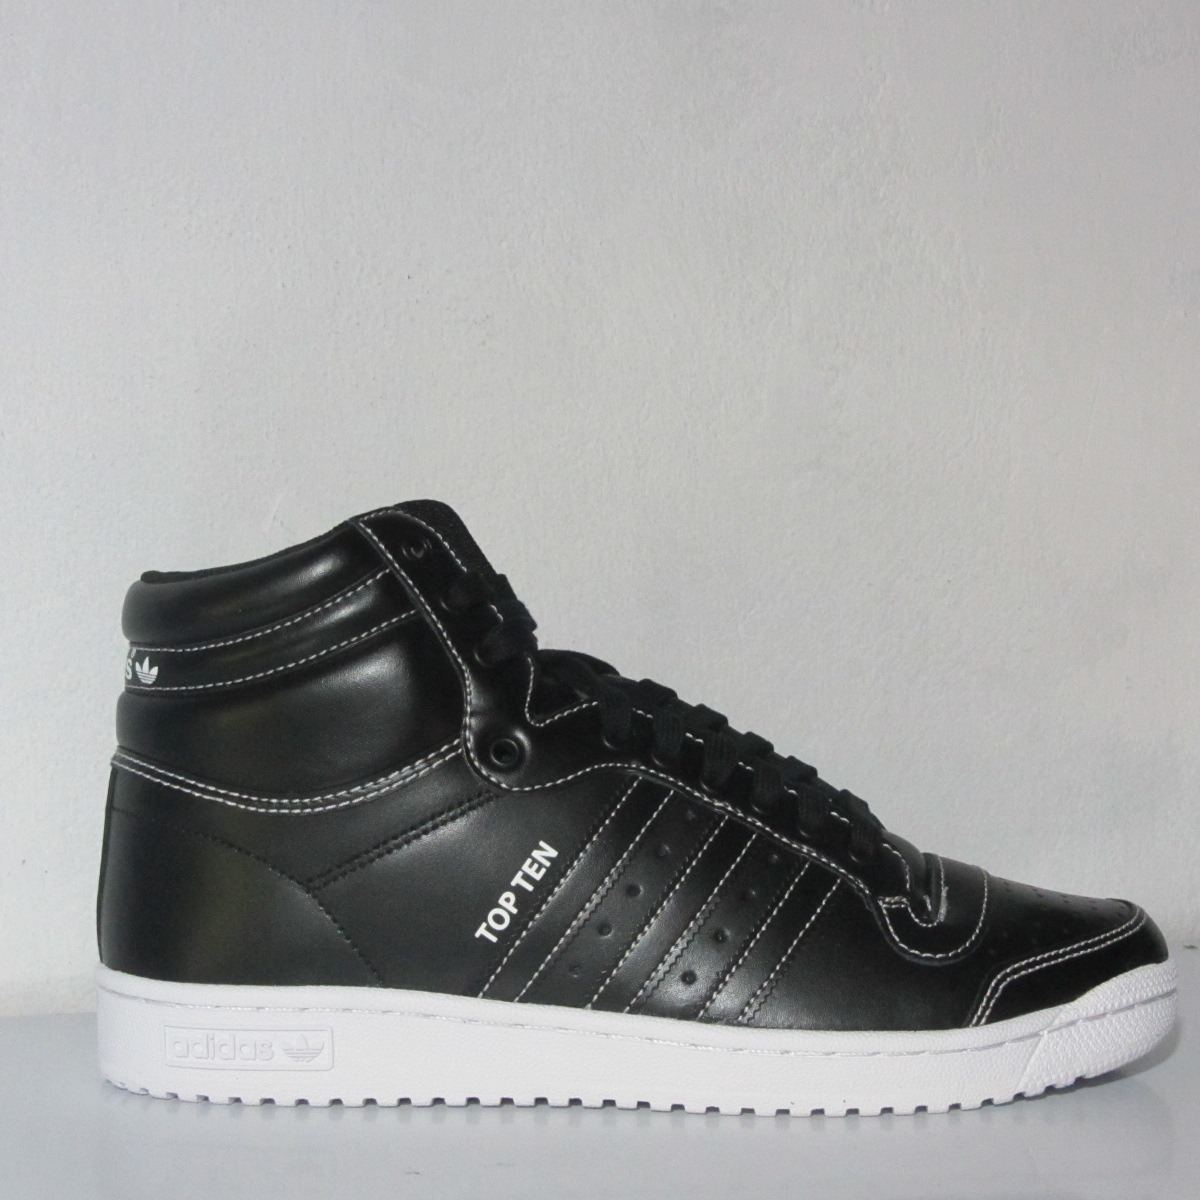 best sneakers 9f4d4 9bfbc zapatillas adidas originals top ten hi f37608. Cargando zoom.